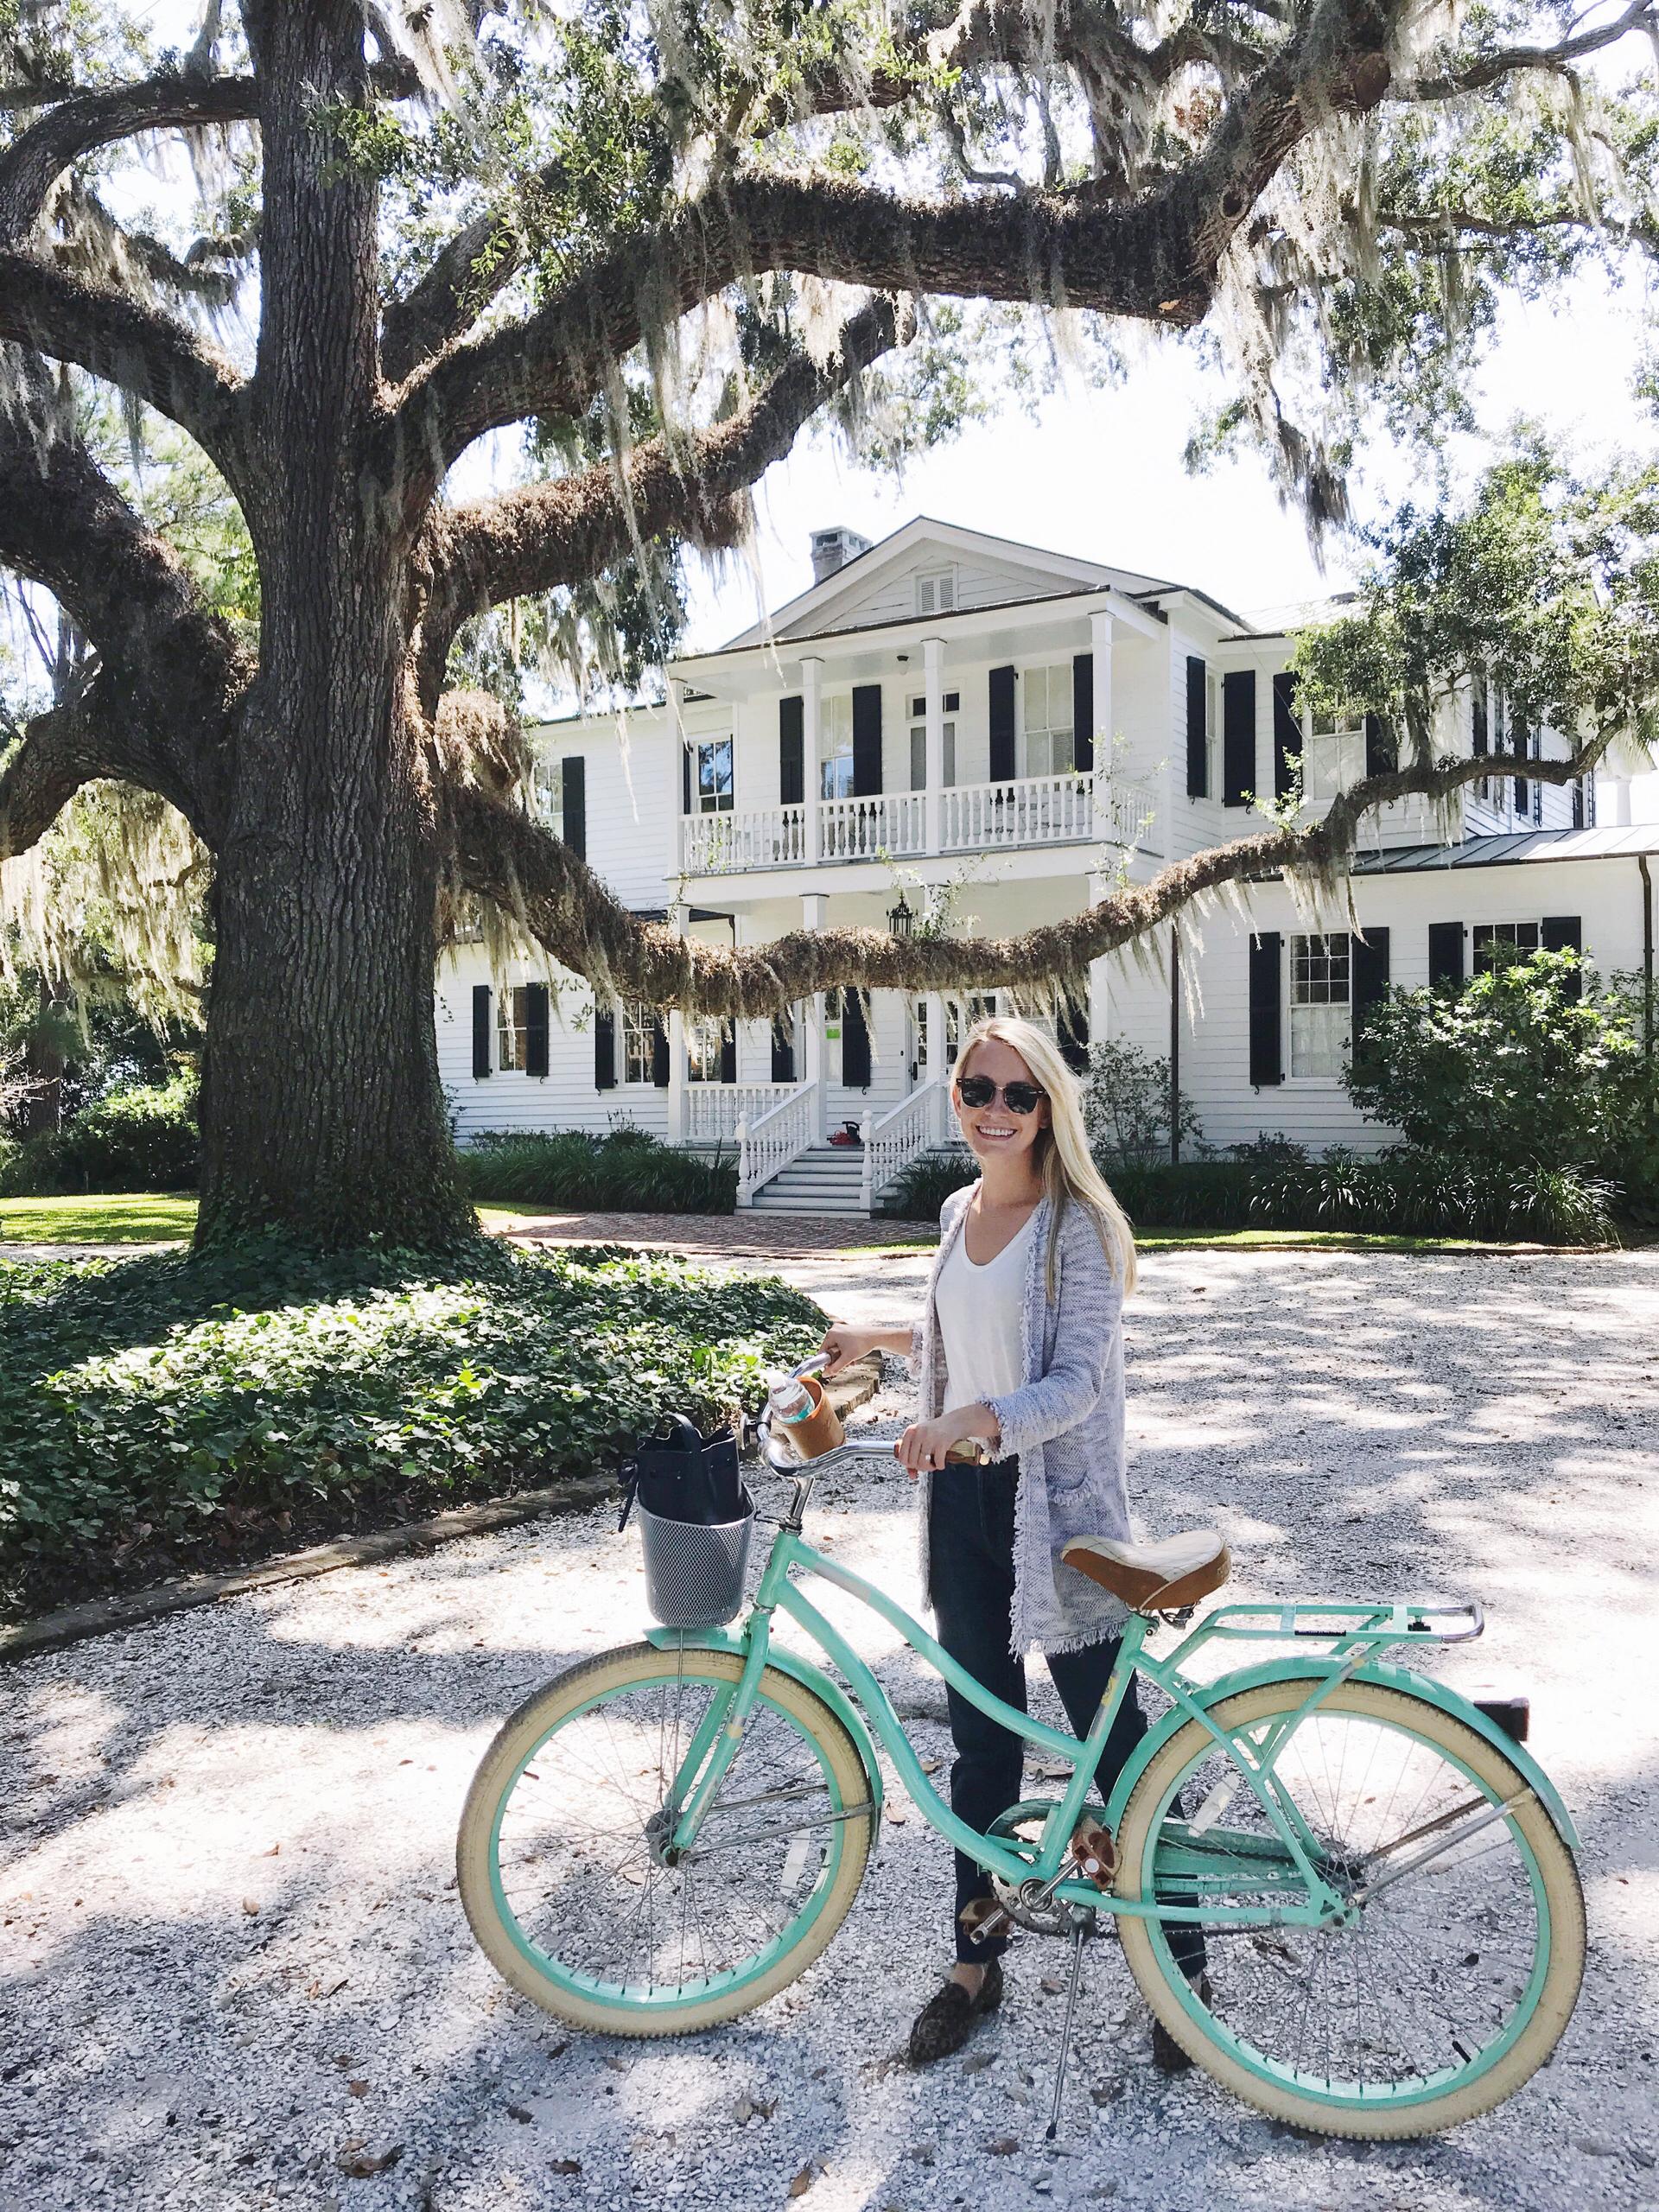 Bike Riding in Beaufort, South Carolina